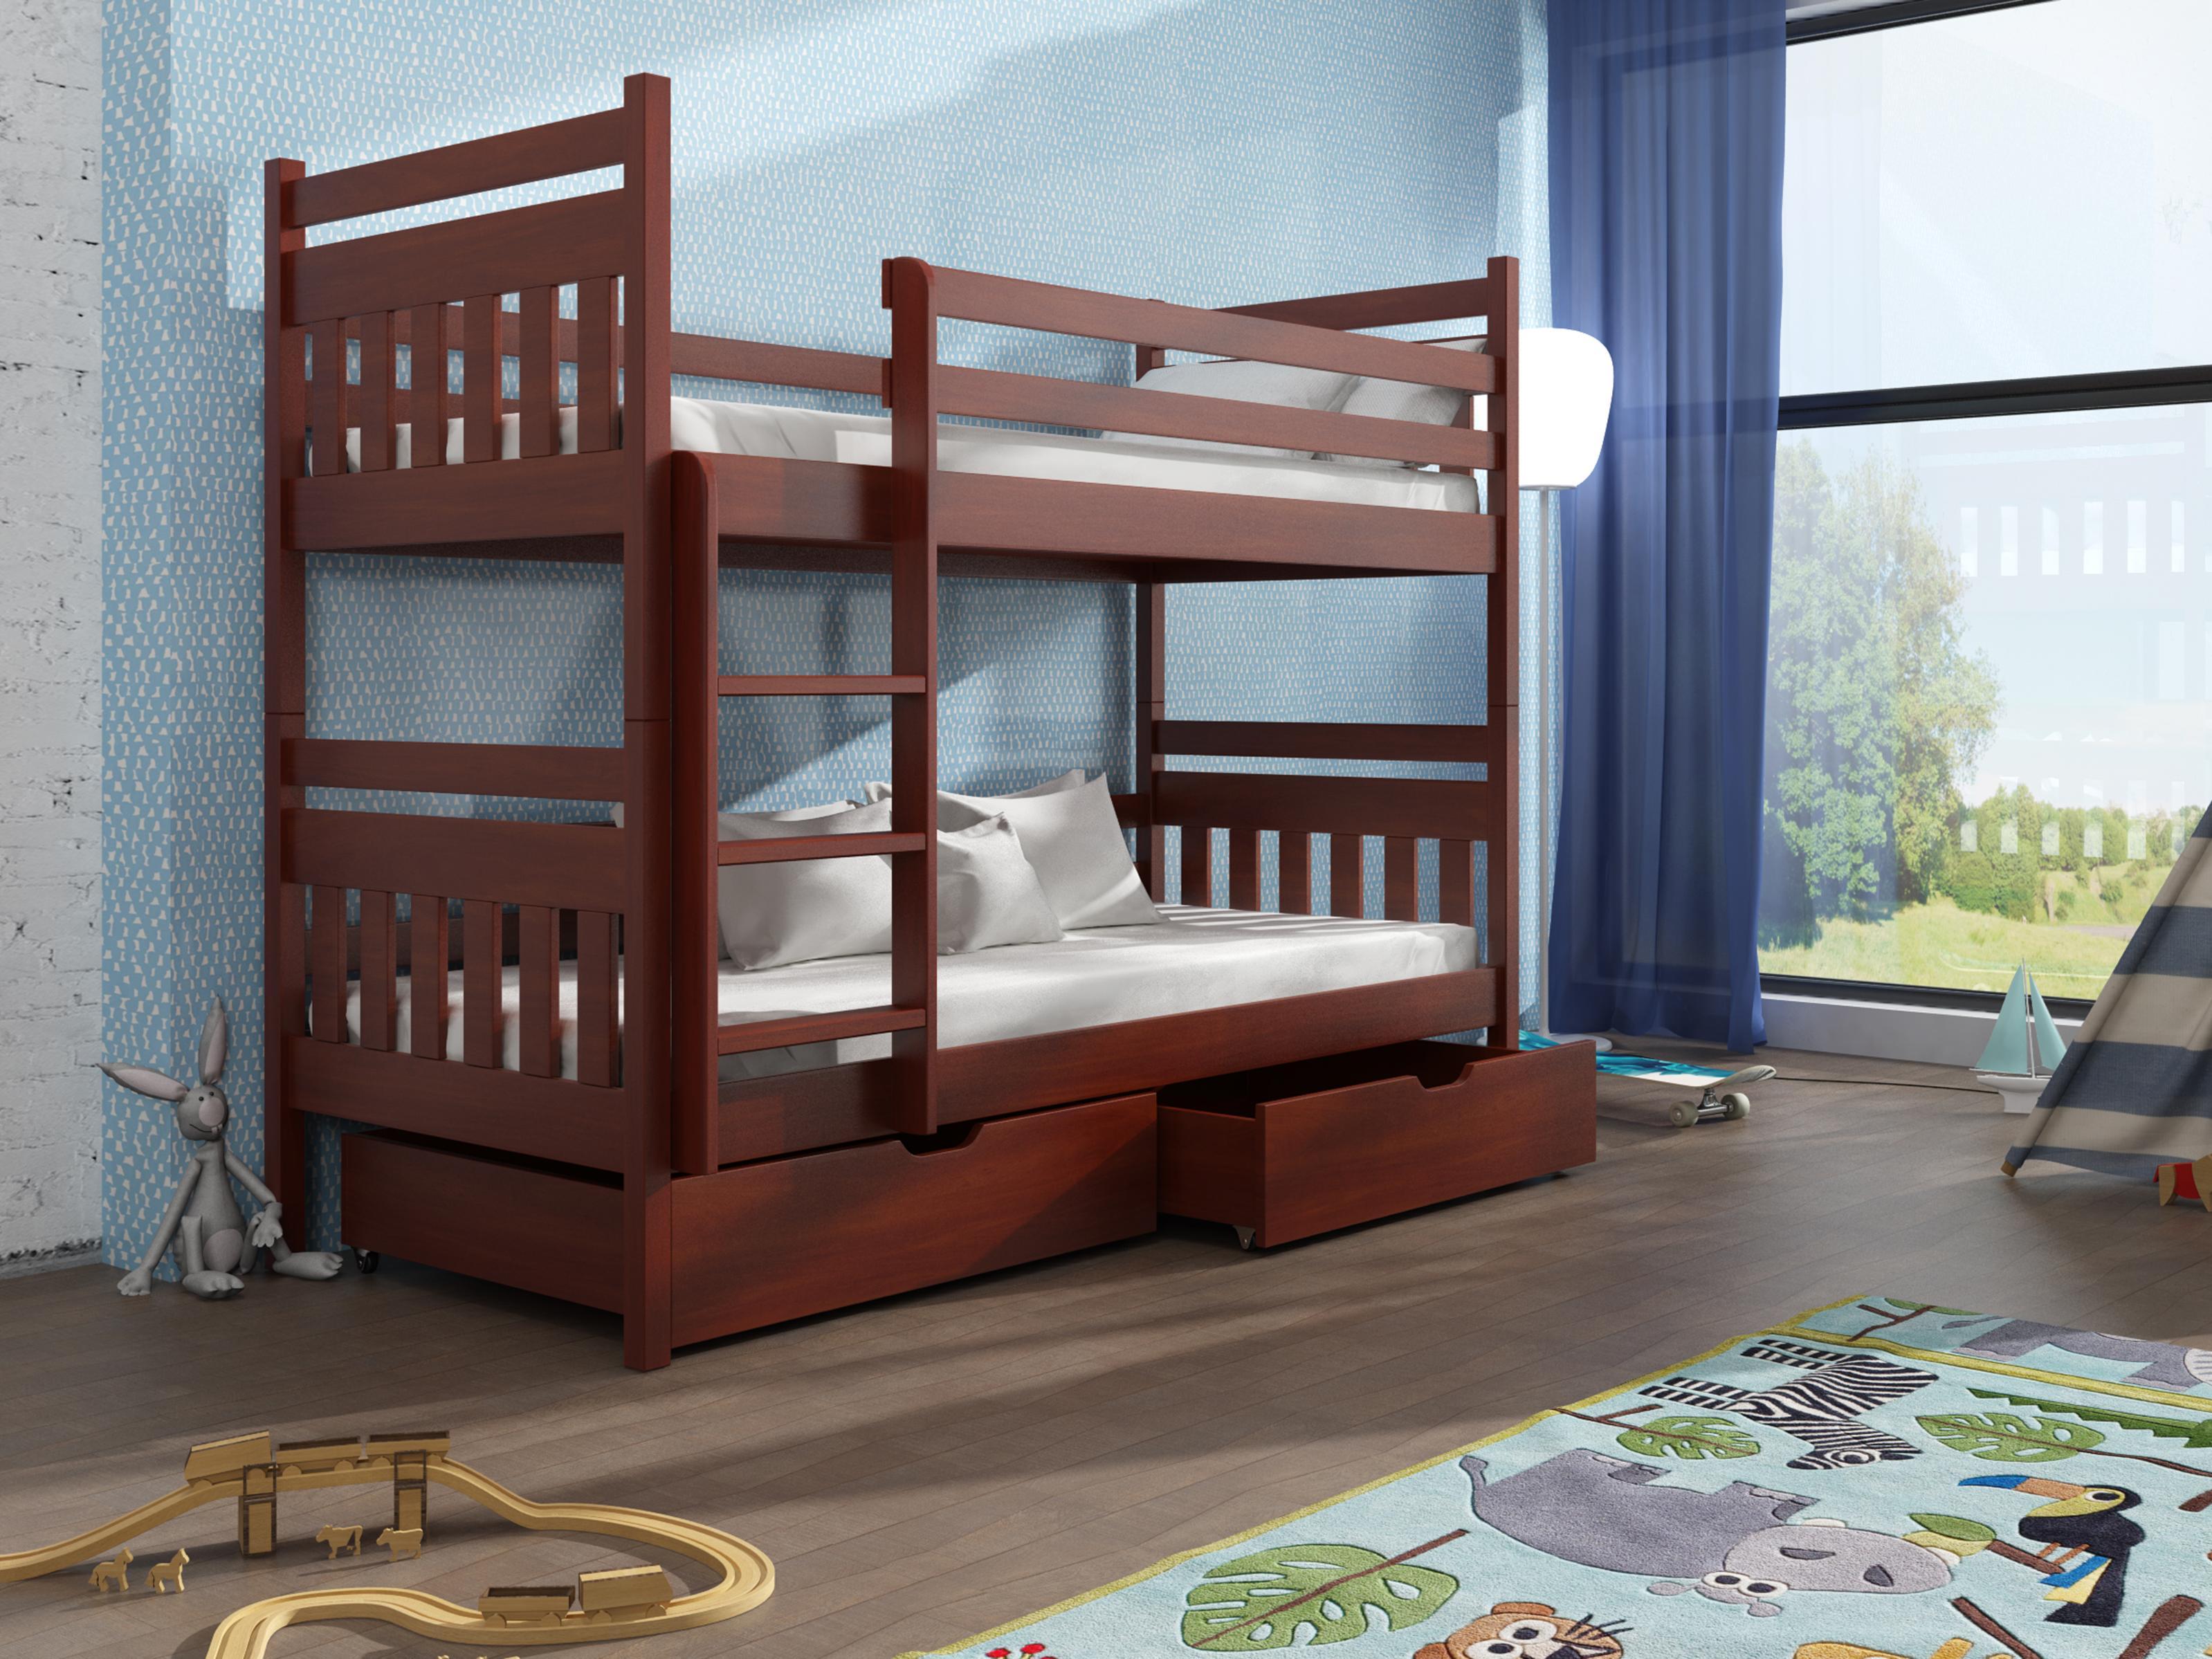 Dětská patrová postel 90 cm - Aras (calvados)